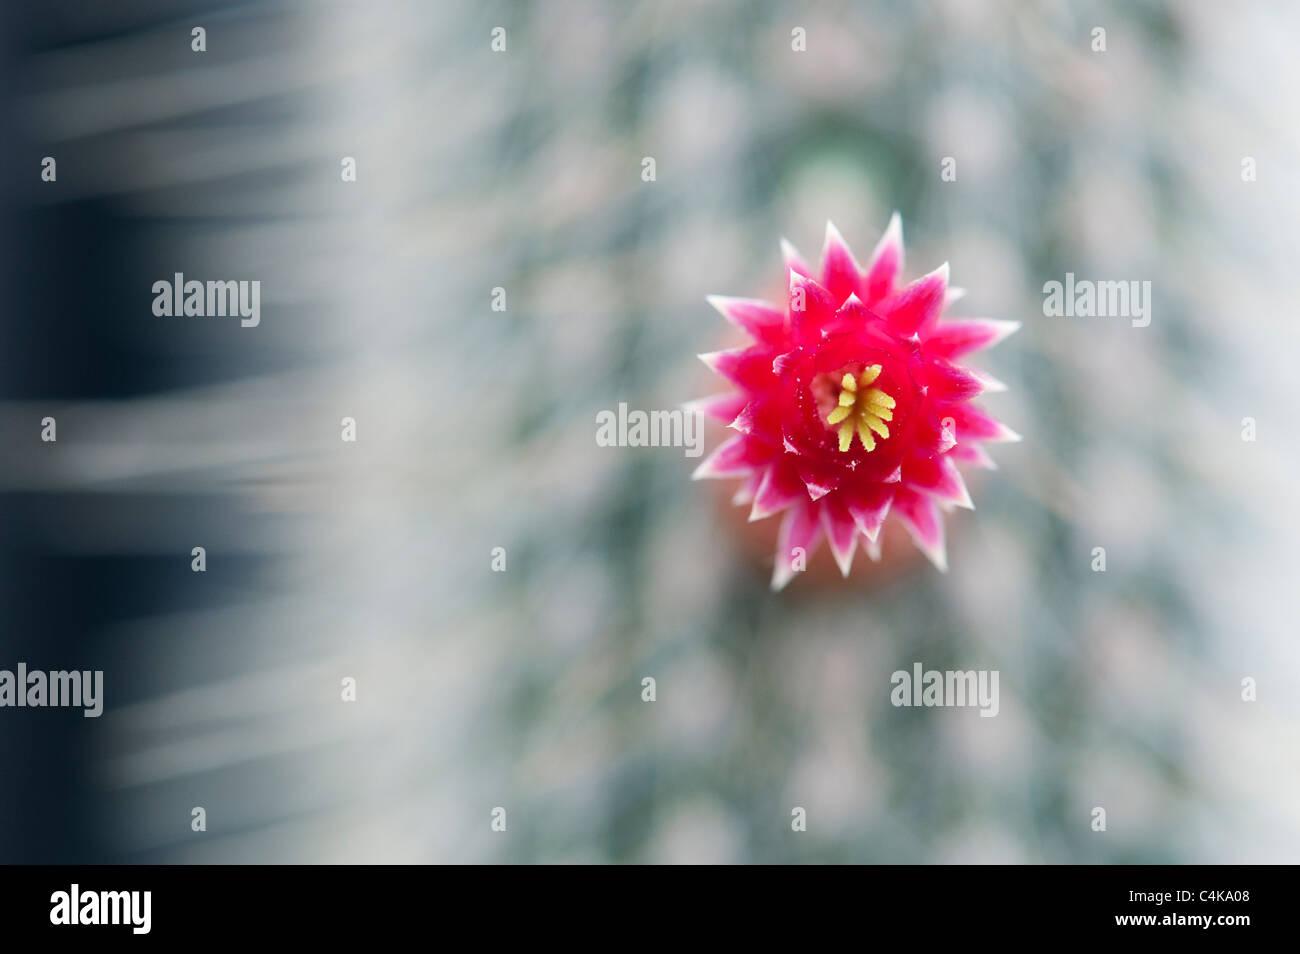 Cleistocactus parviflorus . Cactus de floración Imagen De Stock